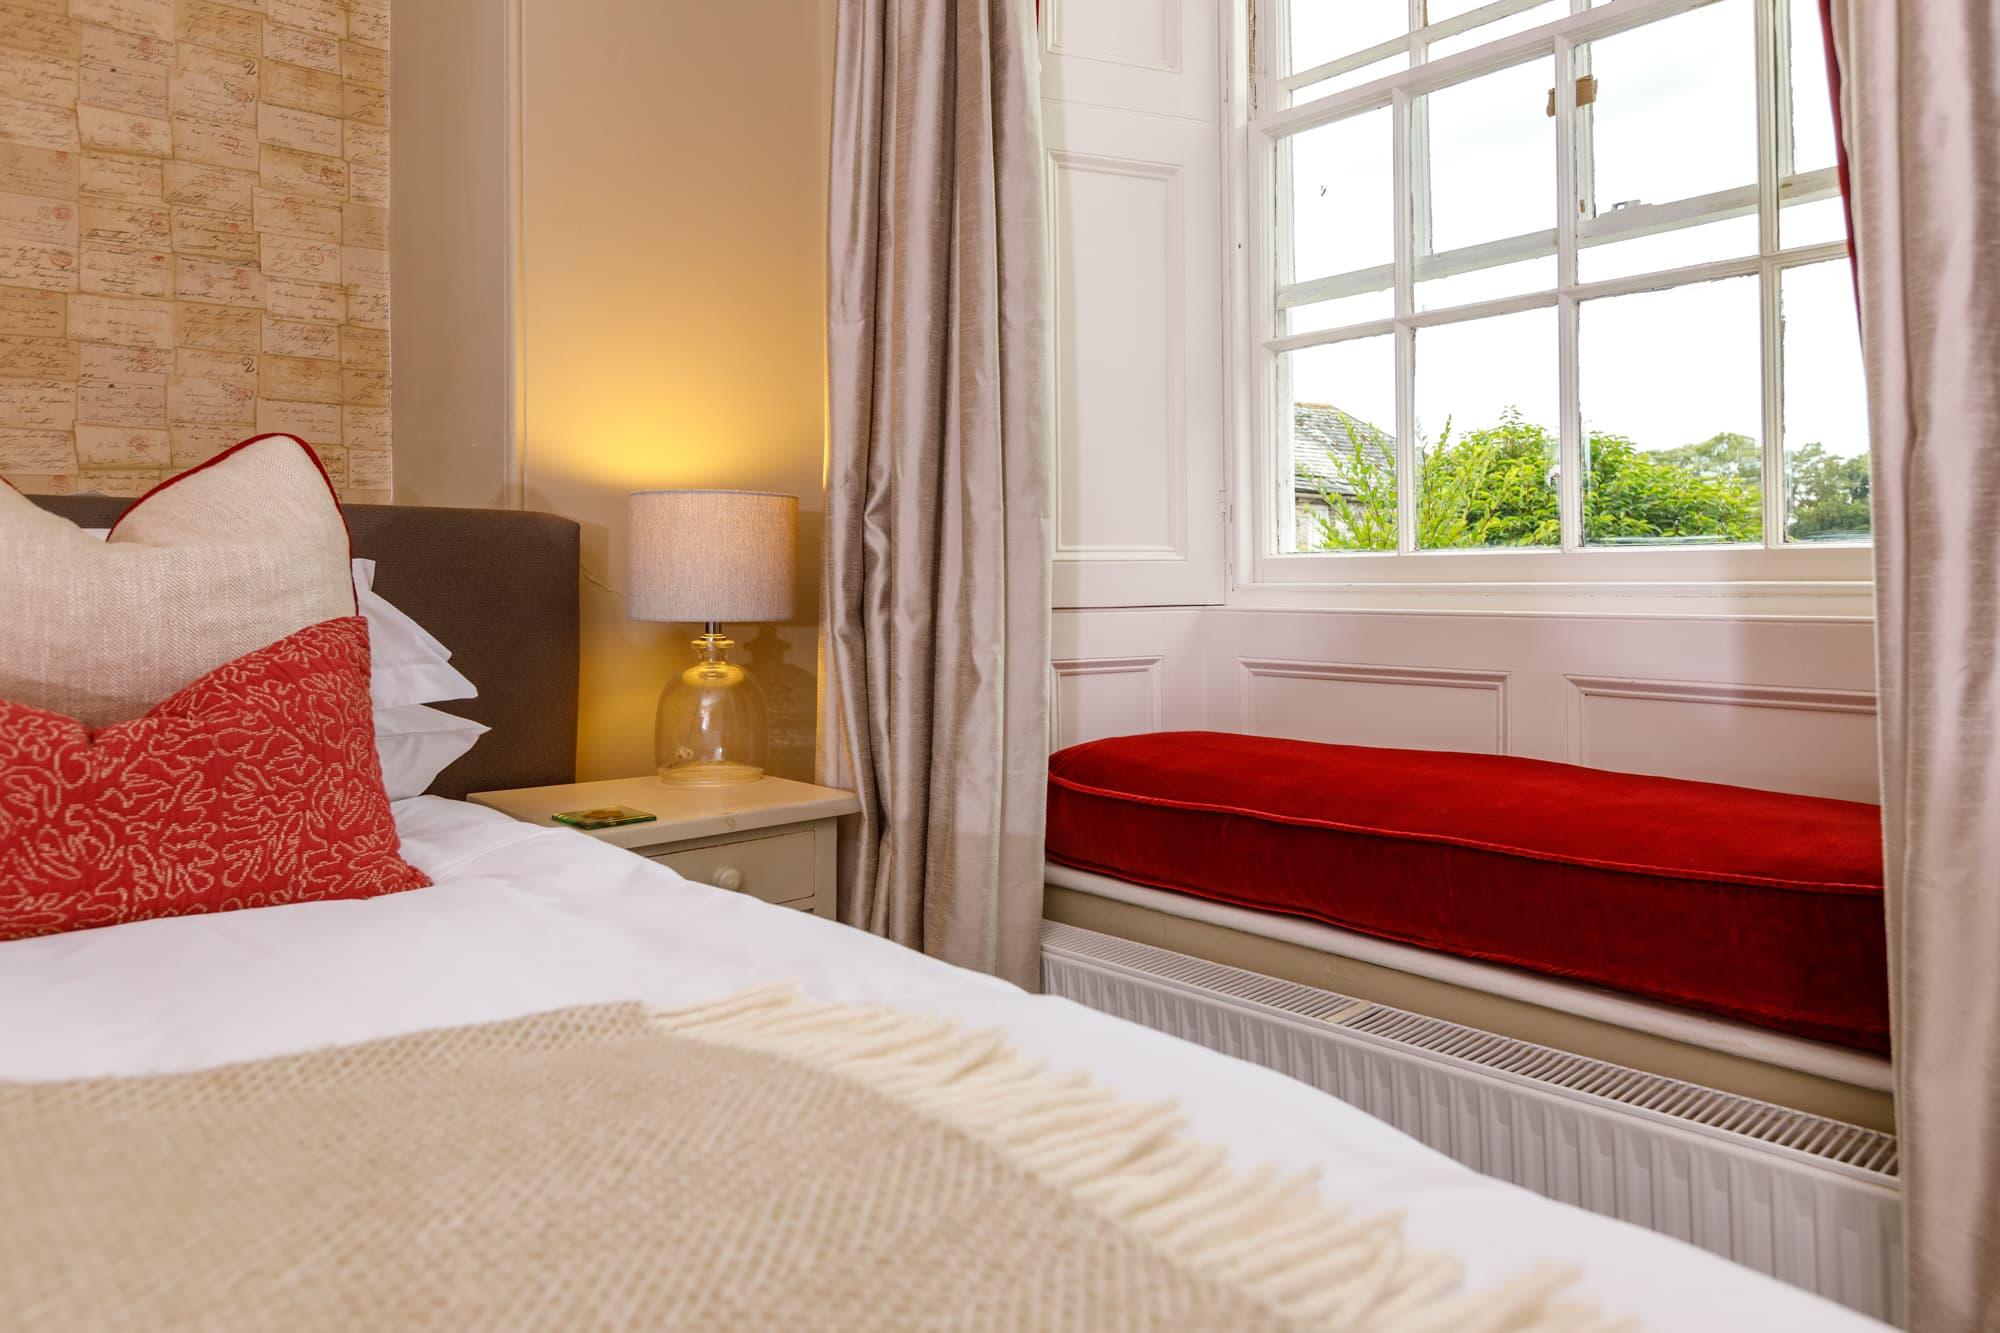 Greenaway - Bed & window-pichi